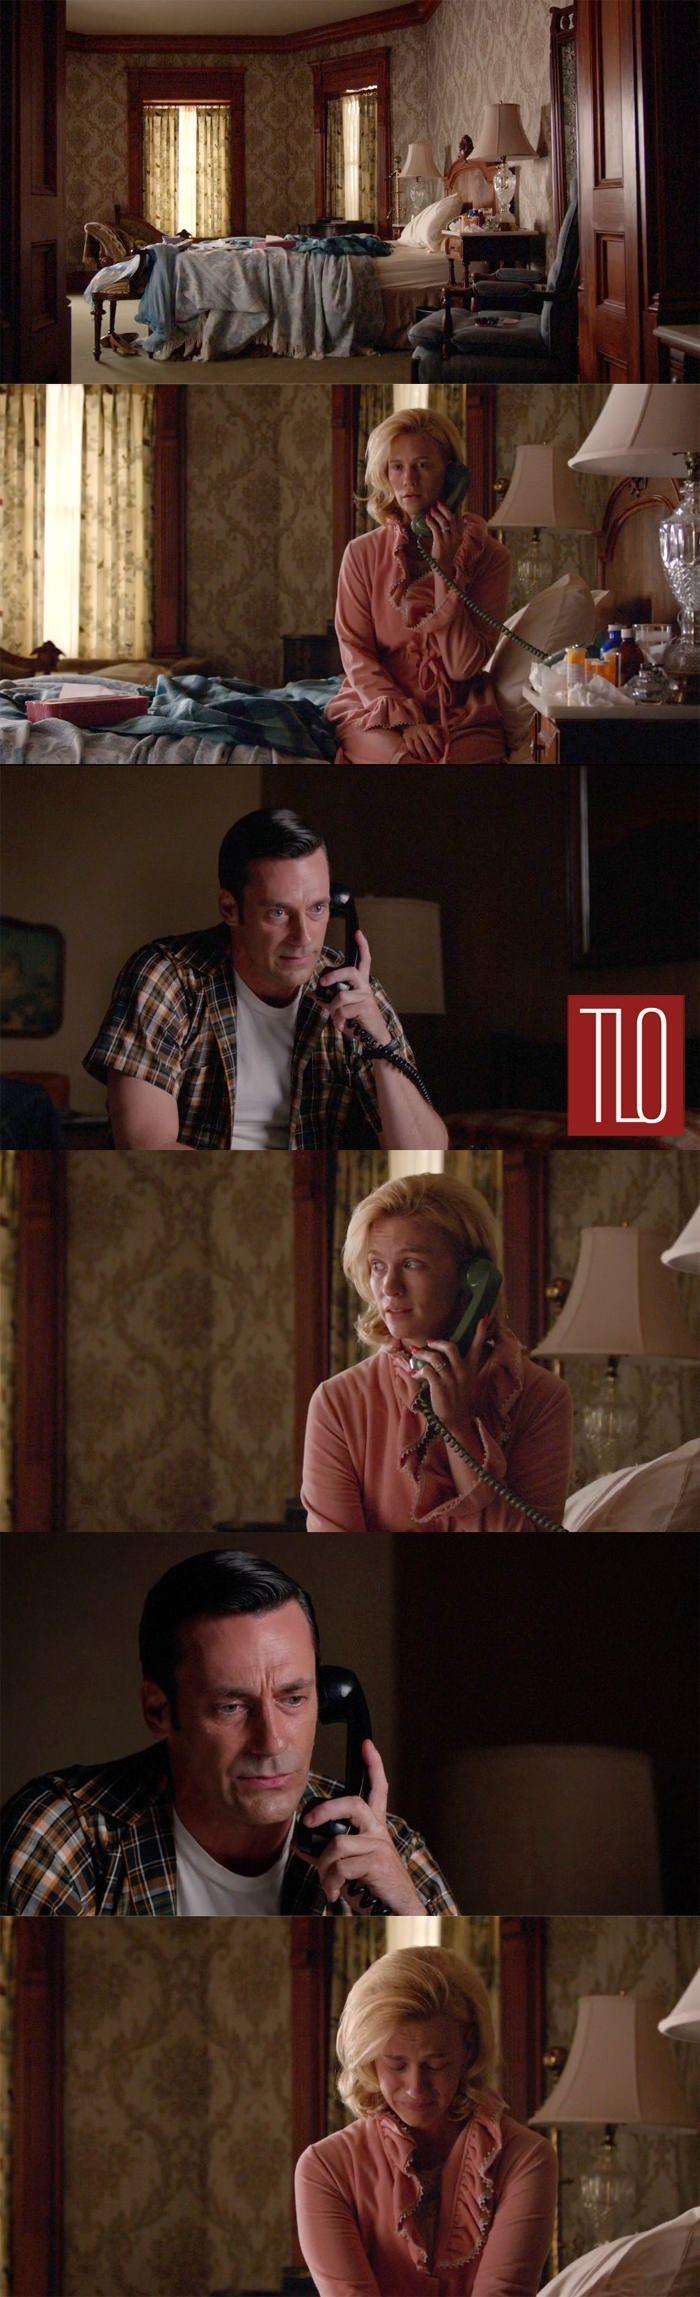 Mad-Men-Season-7-Finale-Mad-Style-Costumes-Television-Tom-Lorenzo-Site-TLO (11)